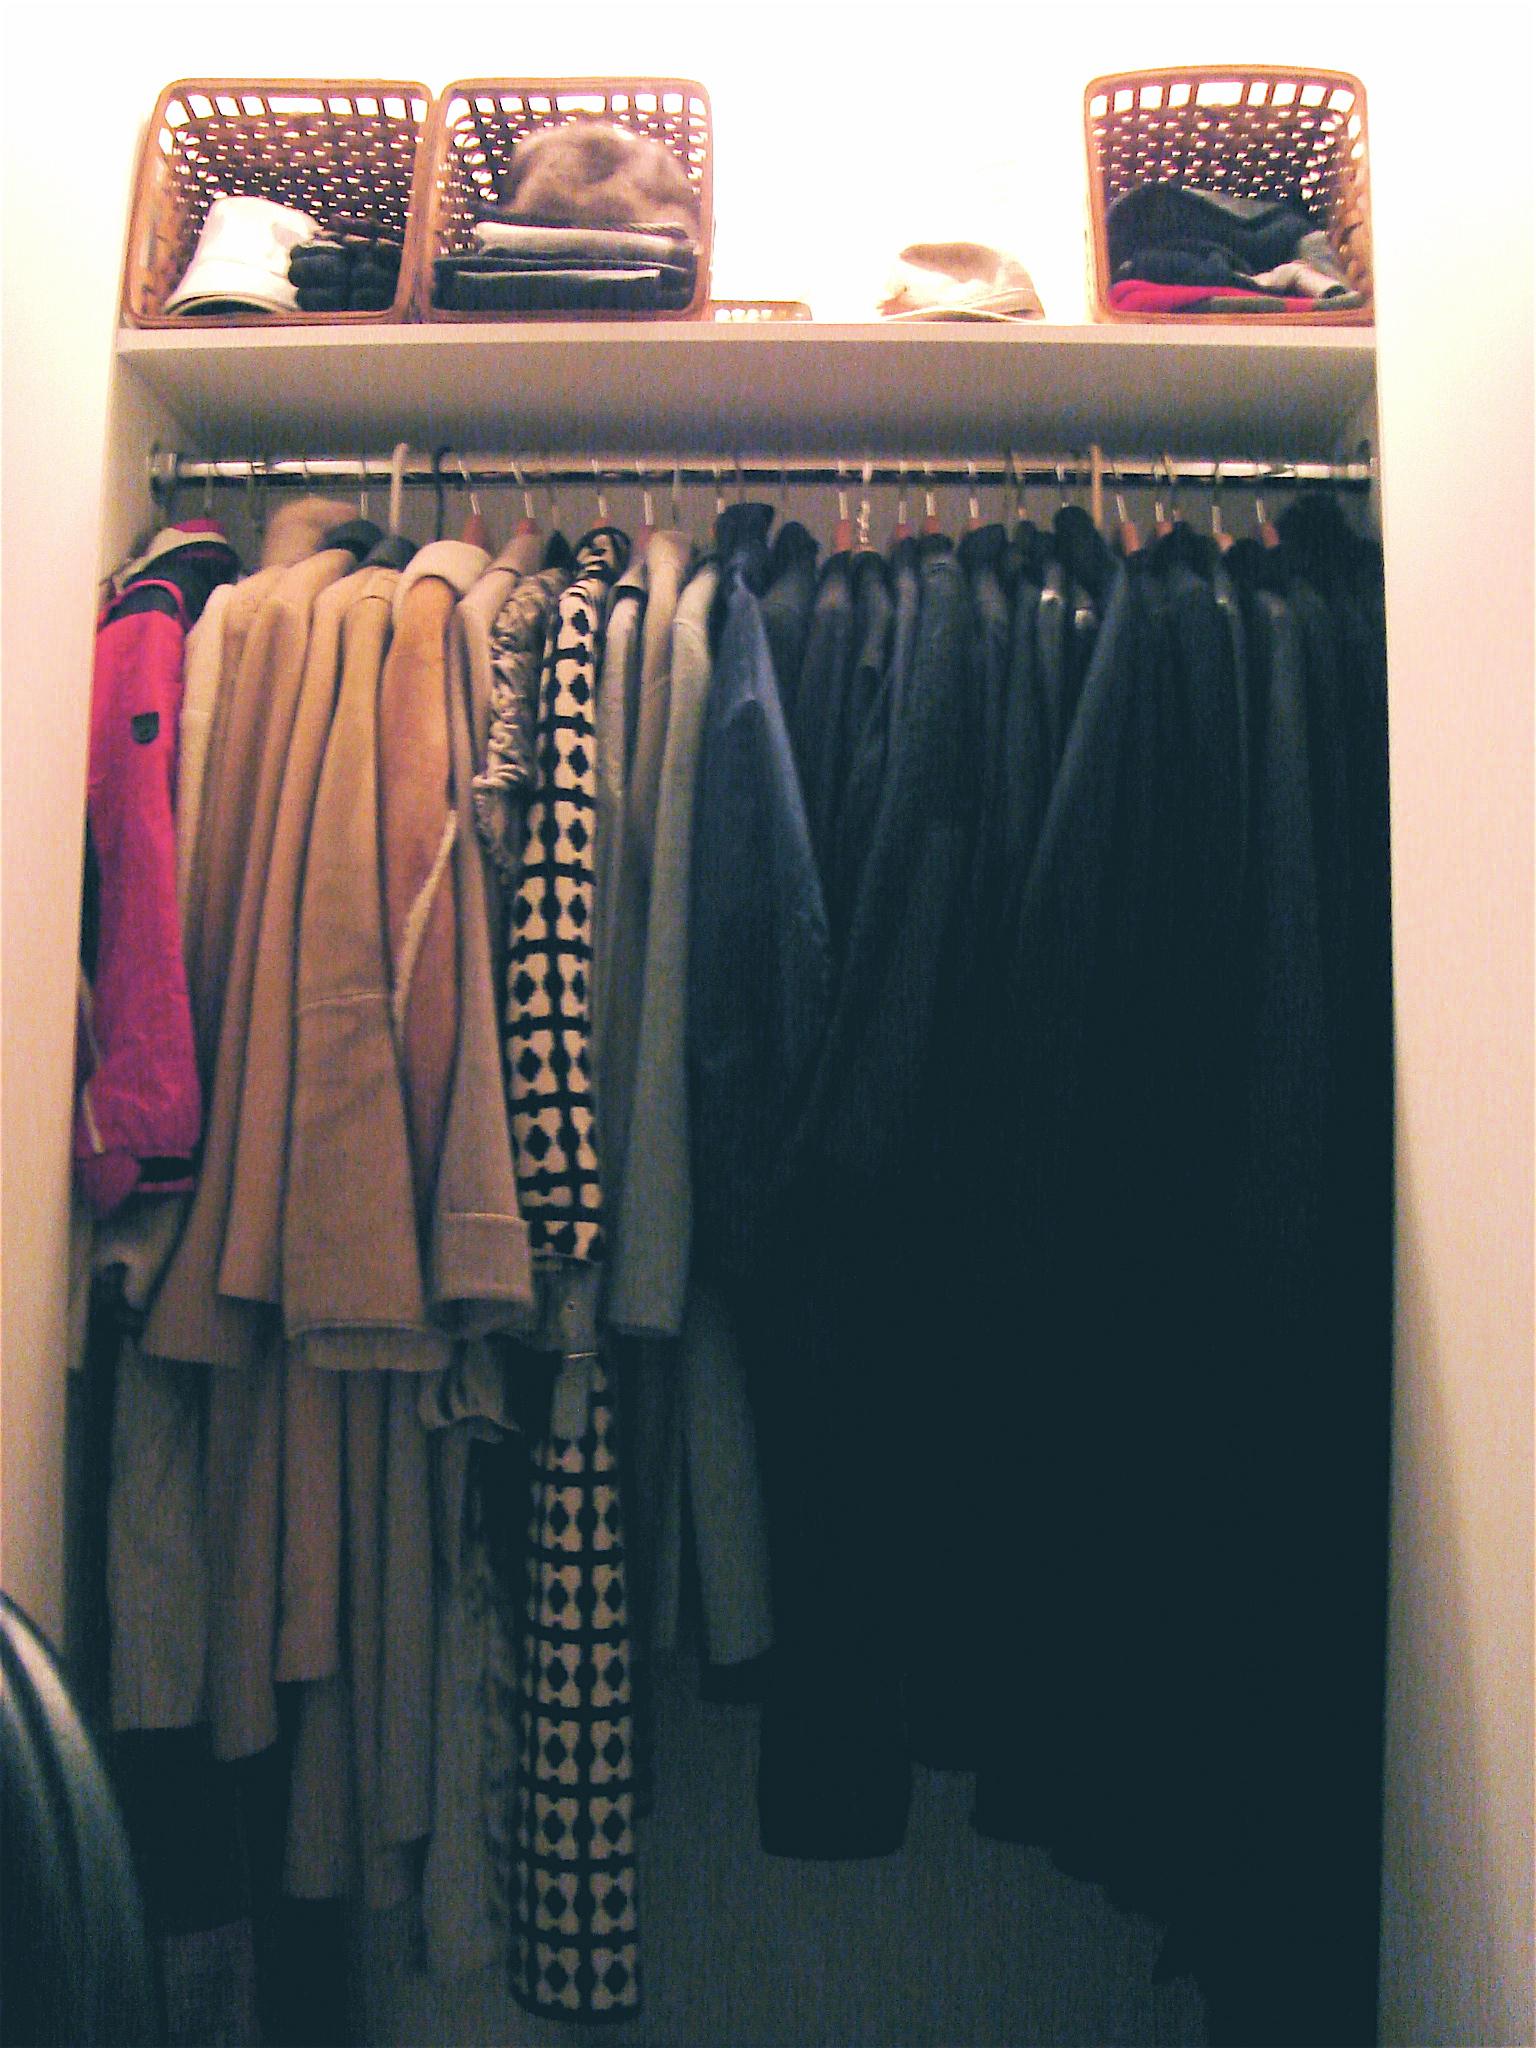 q a handbag storage